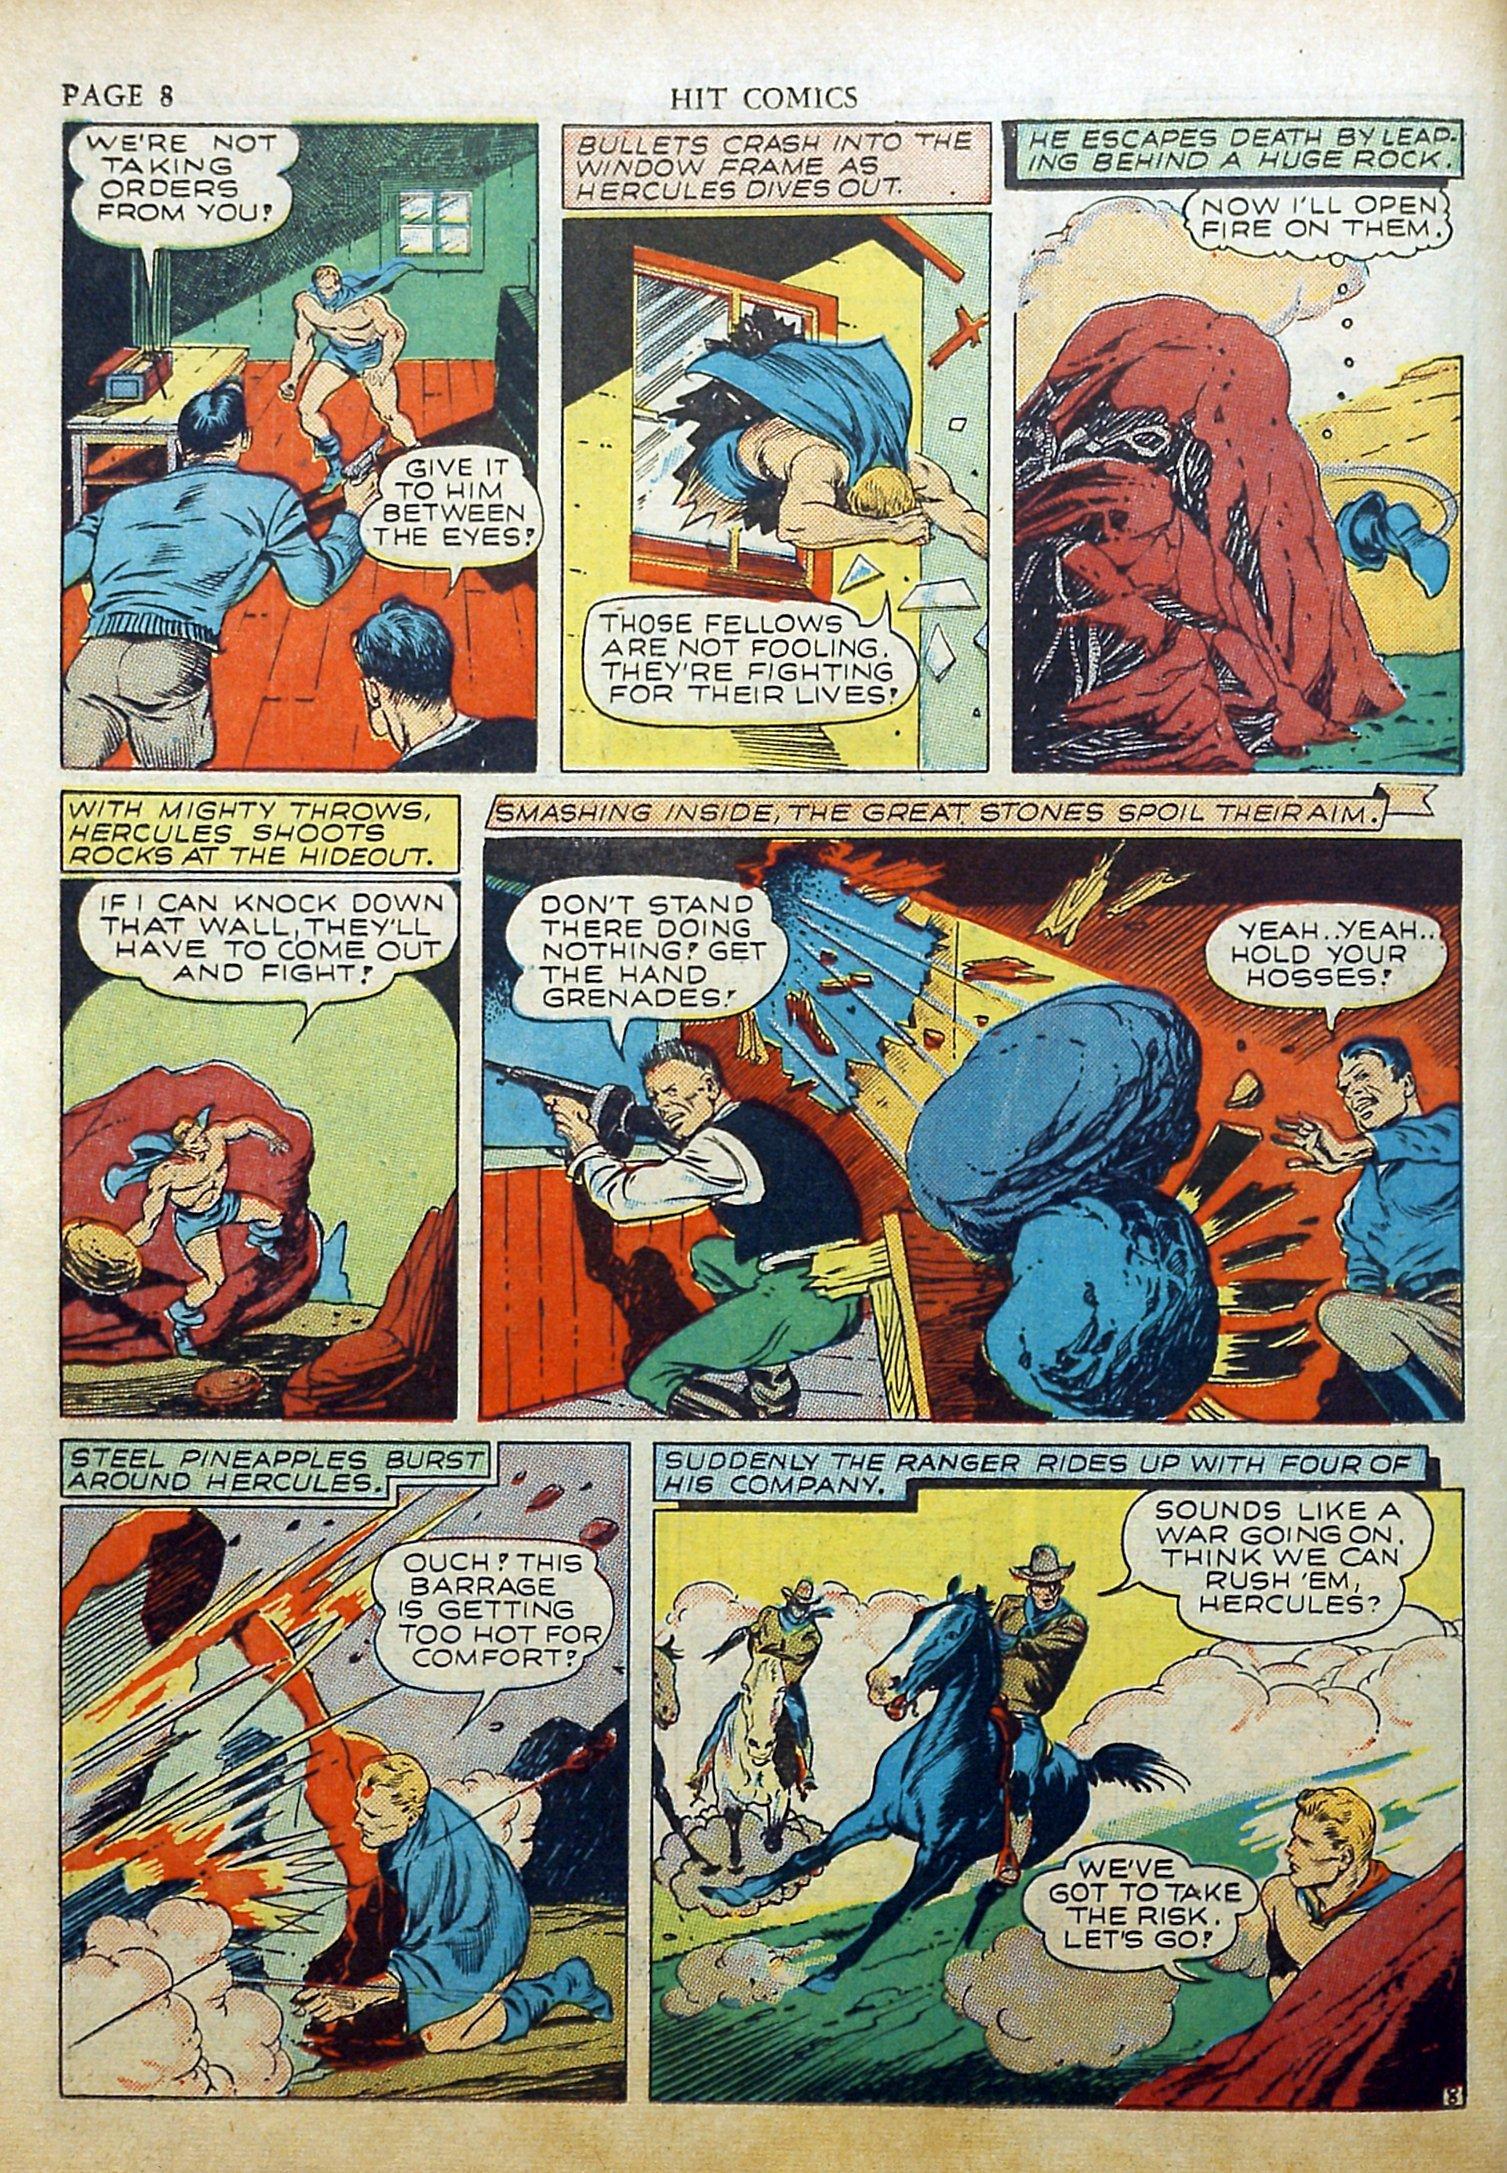 Read online Hit Comics comic -  Issue #17 - 10